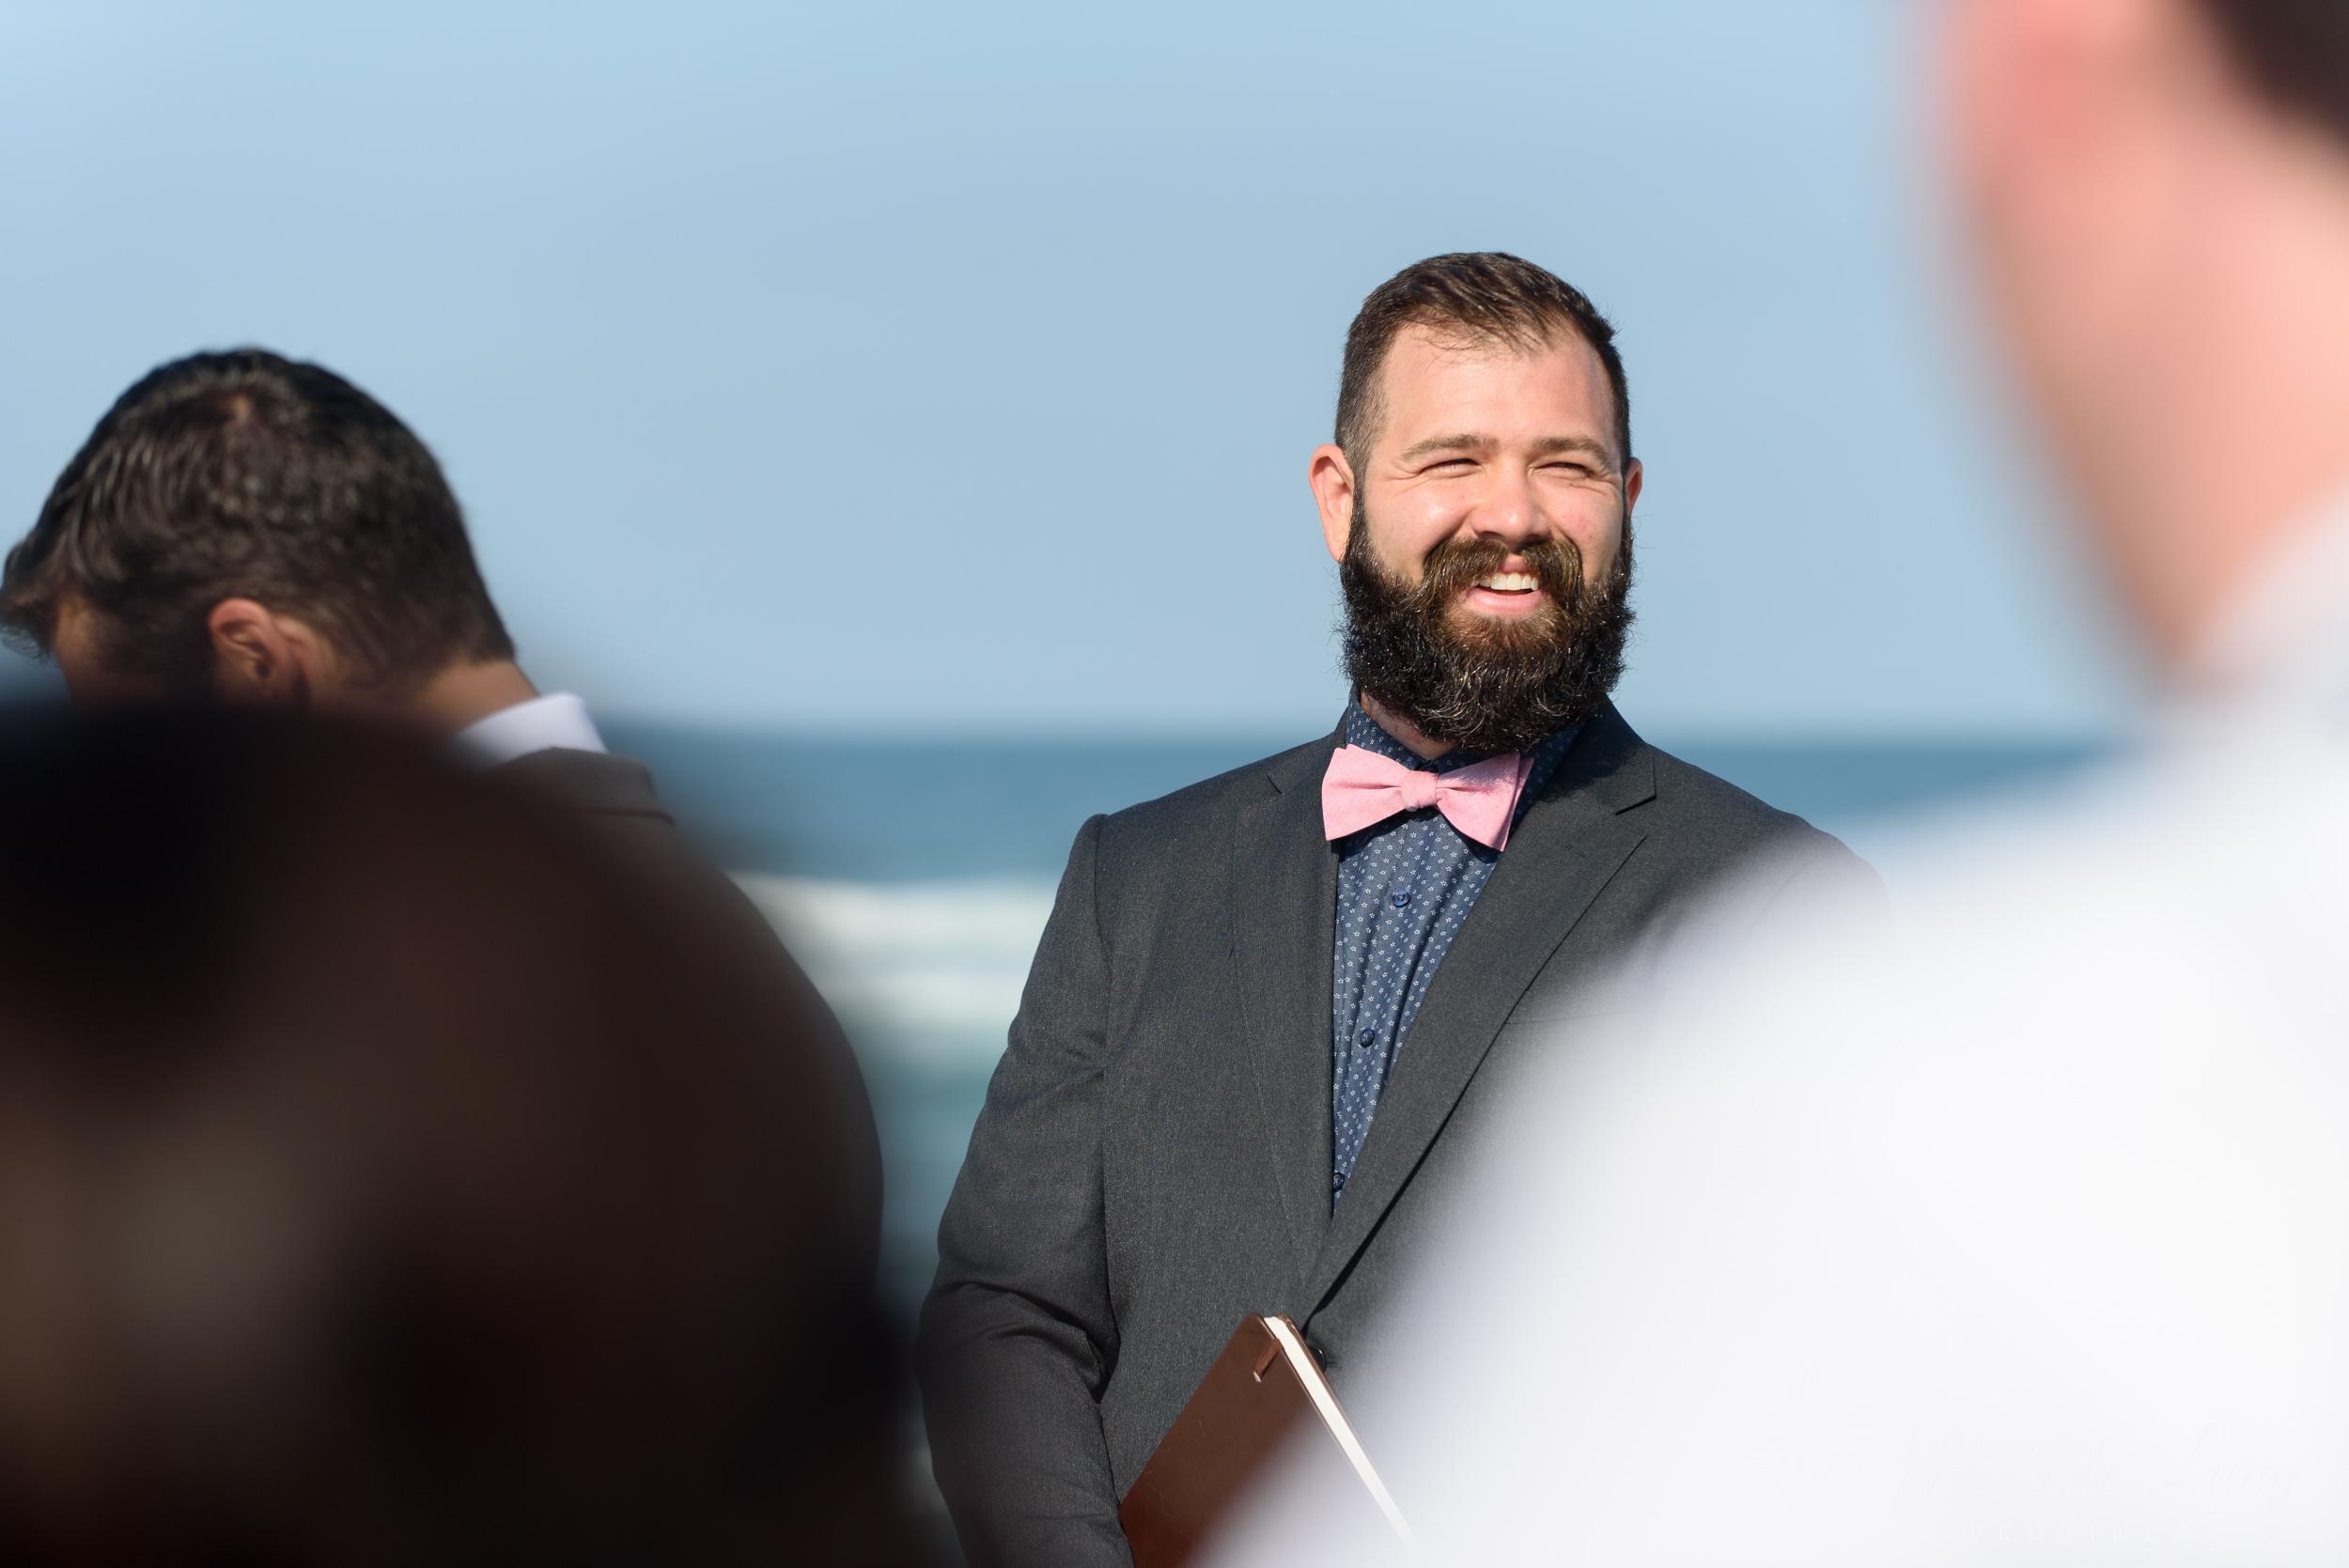 mlw-brant-beach-lbi-wedding-photography-26.jpg